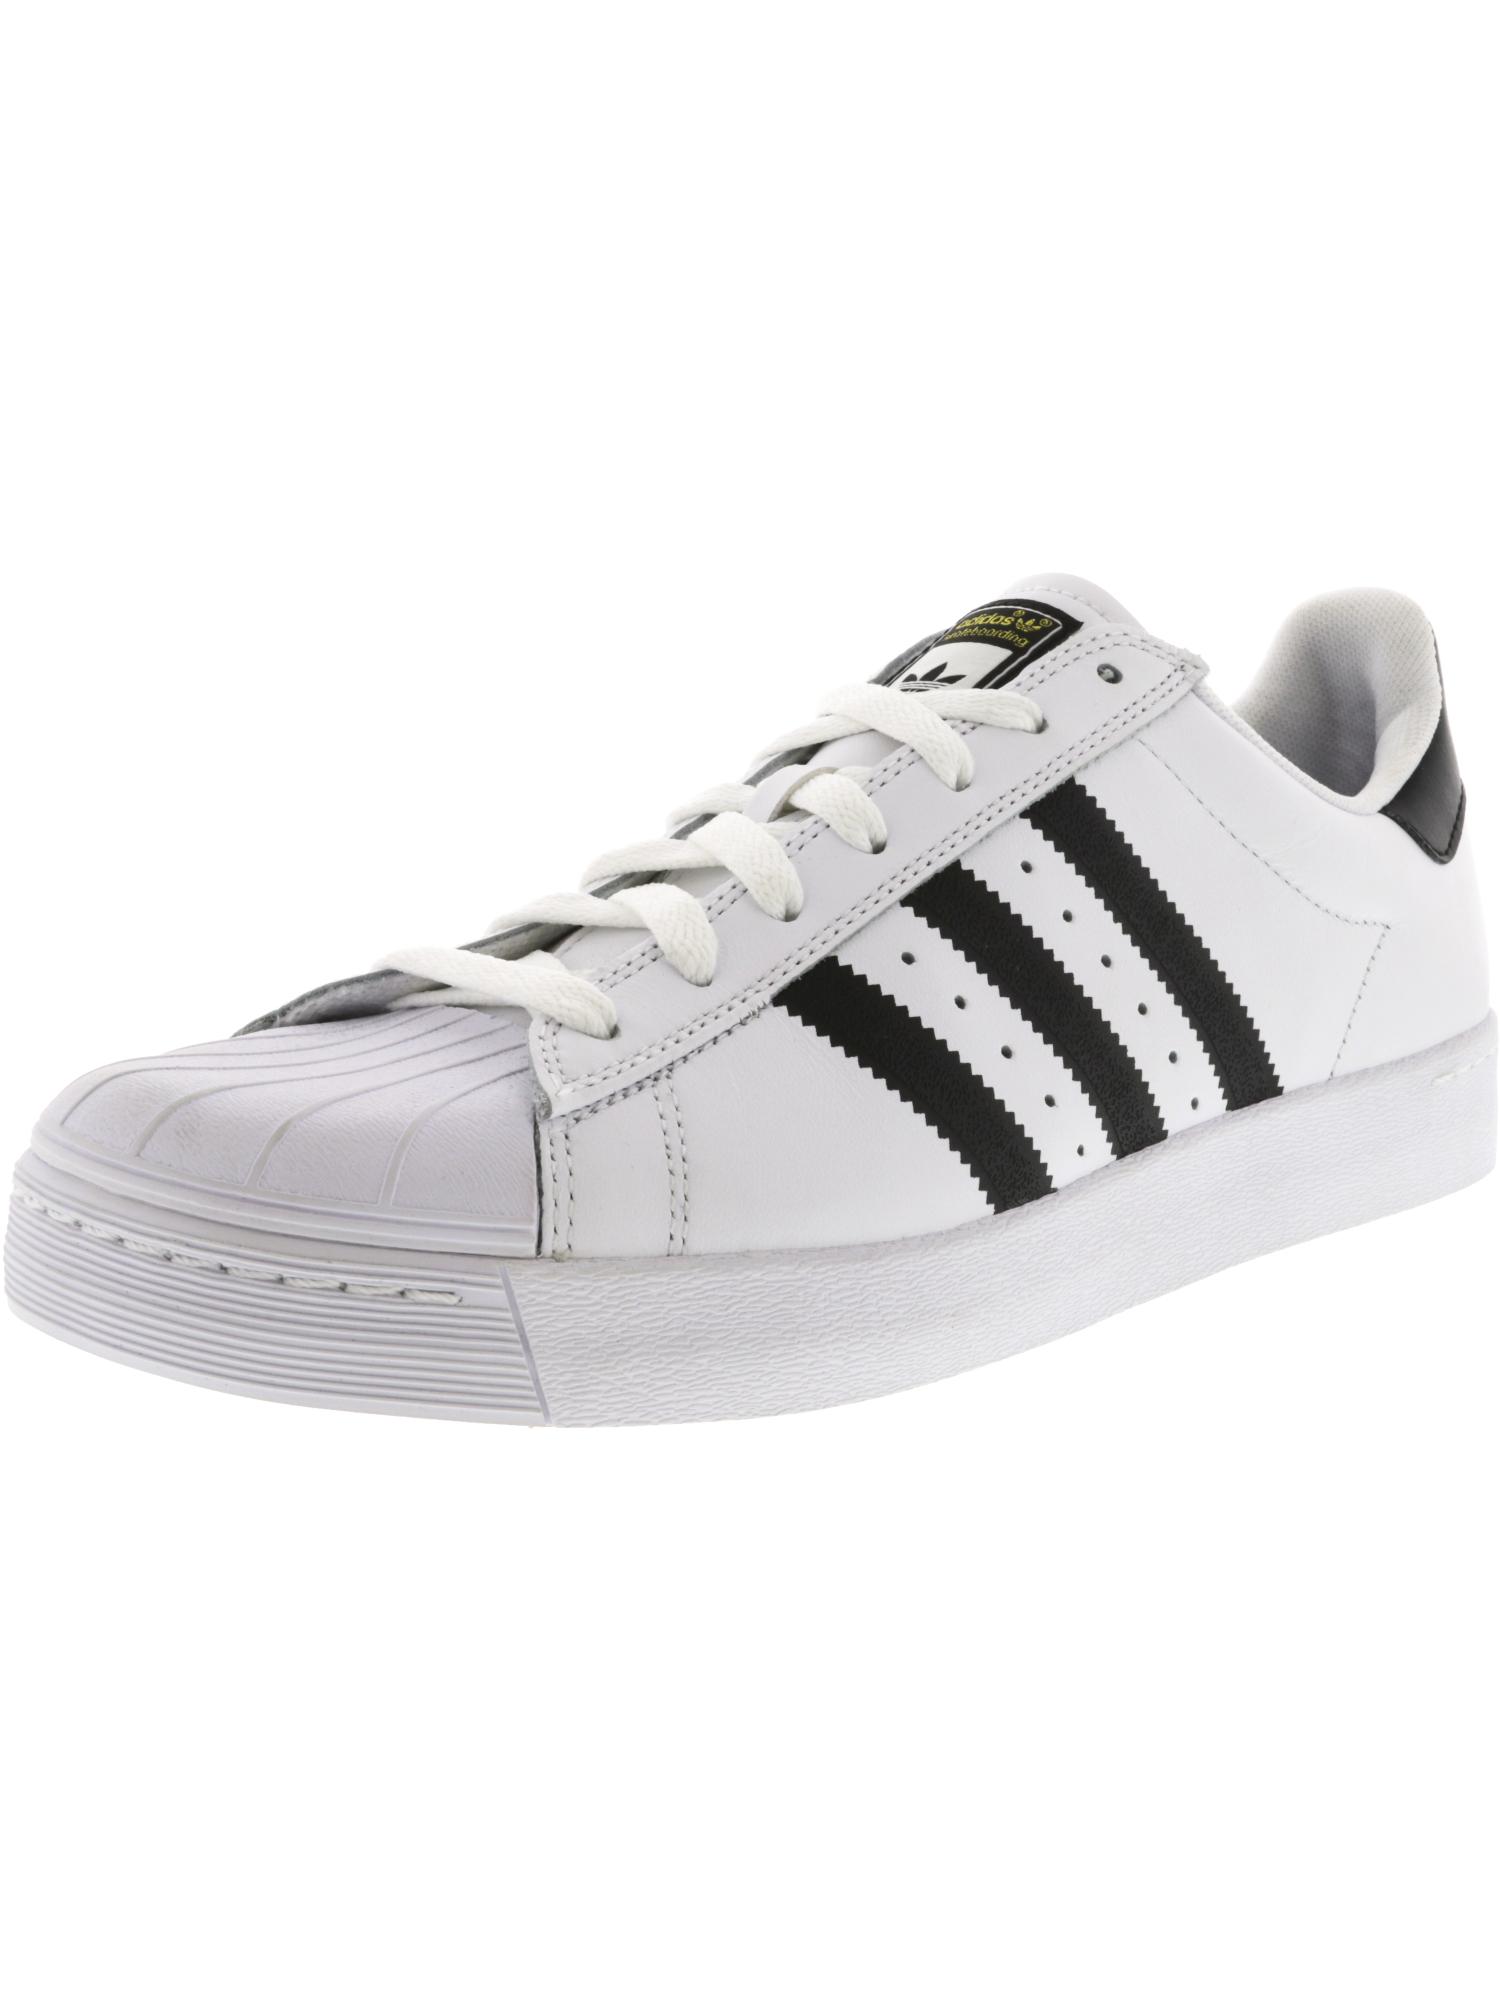 adidas Superstar Vulc ADV D68718 12